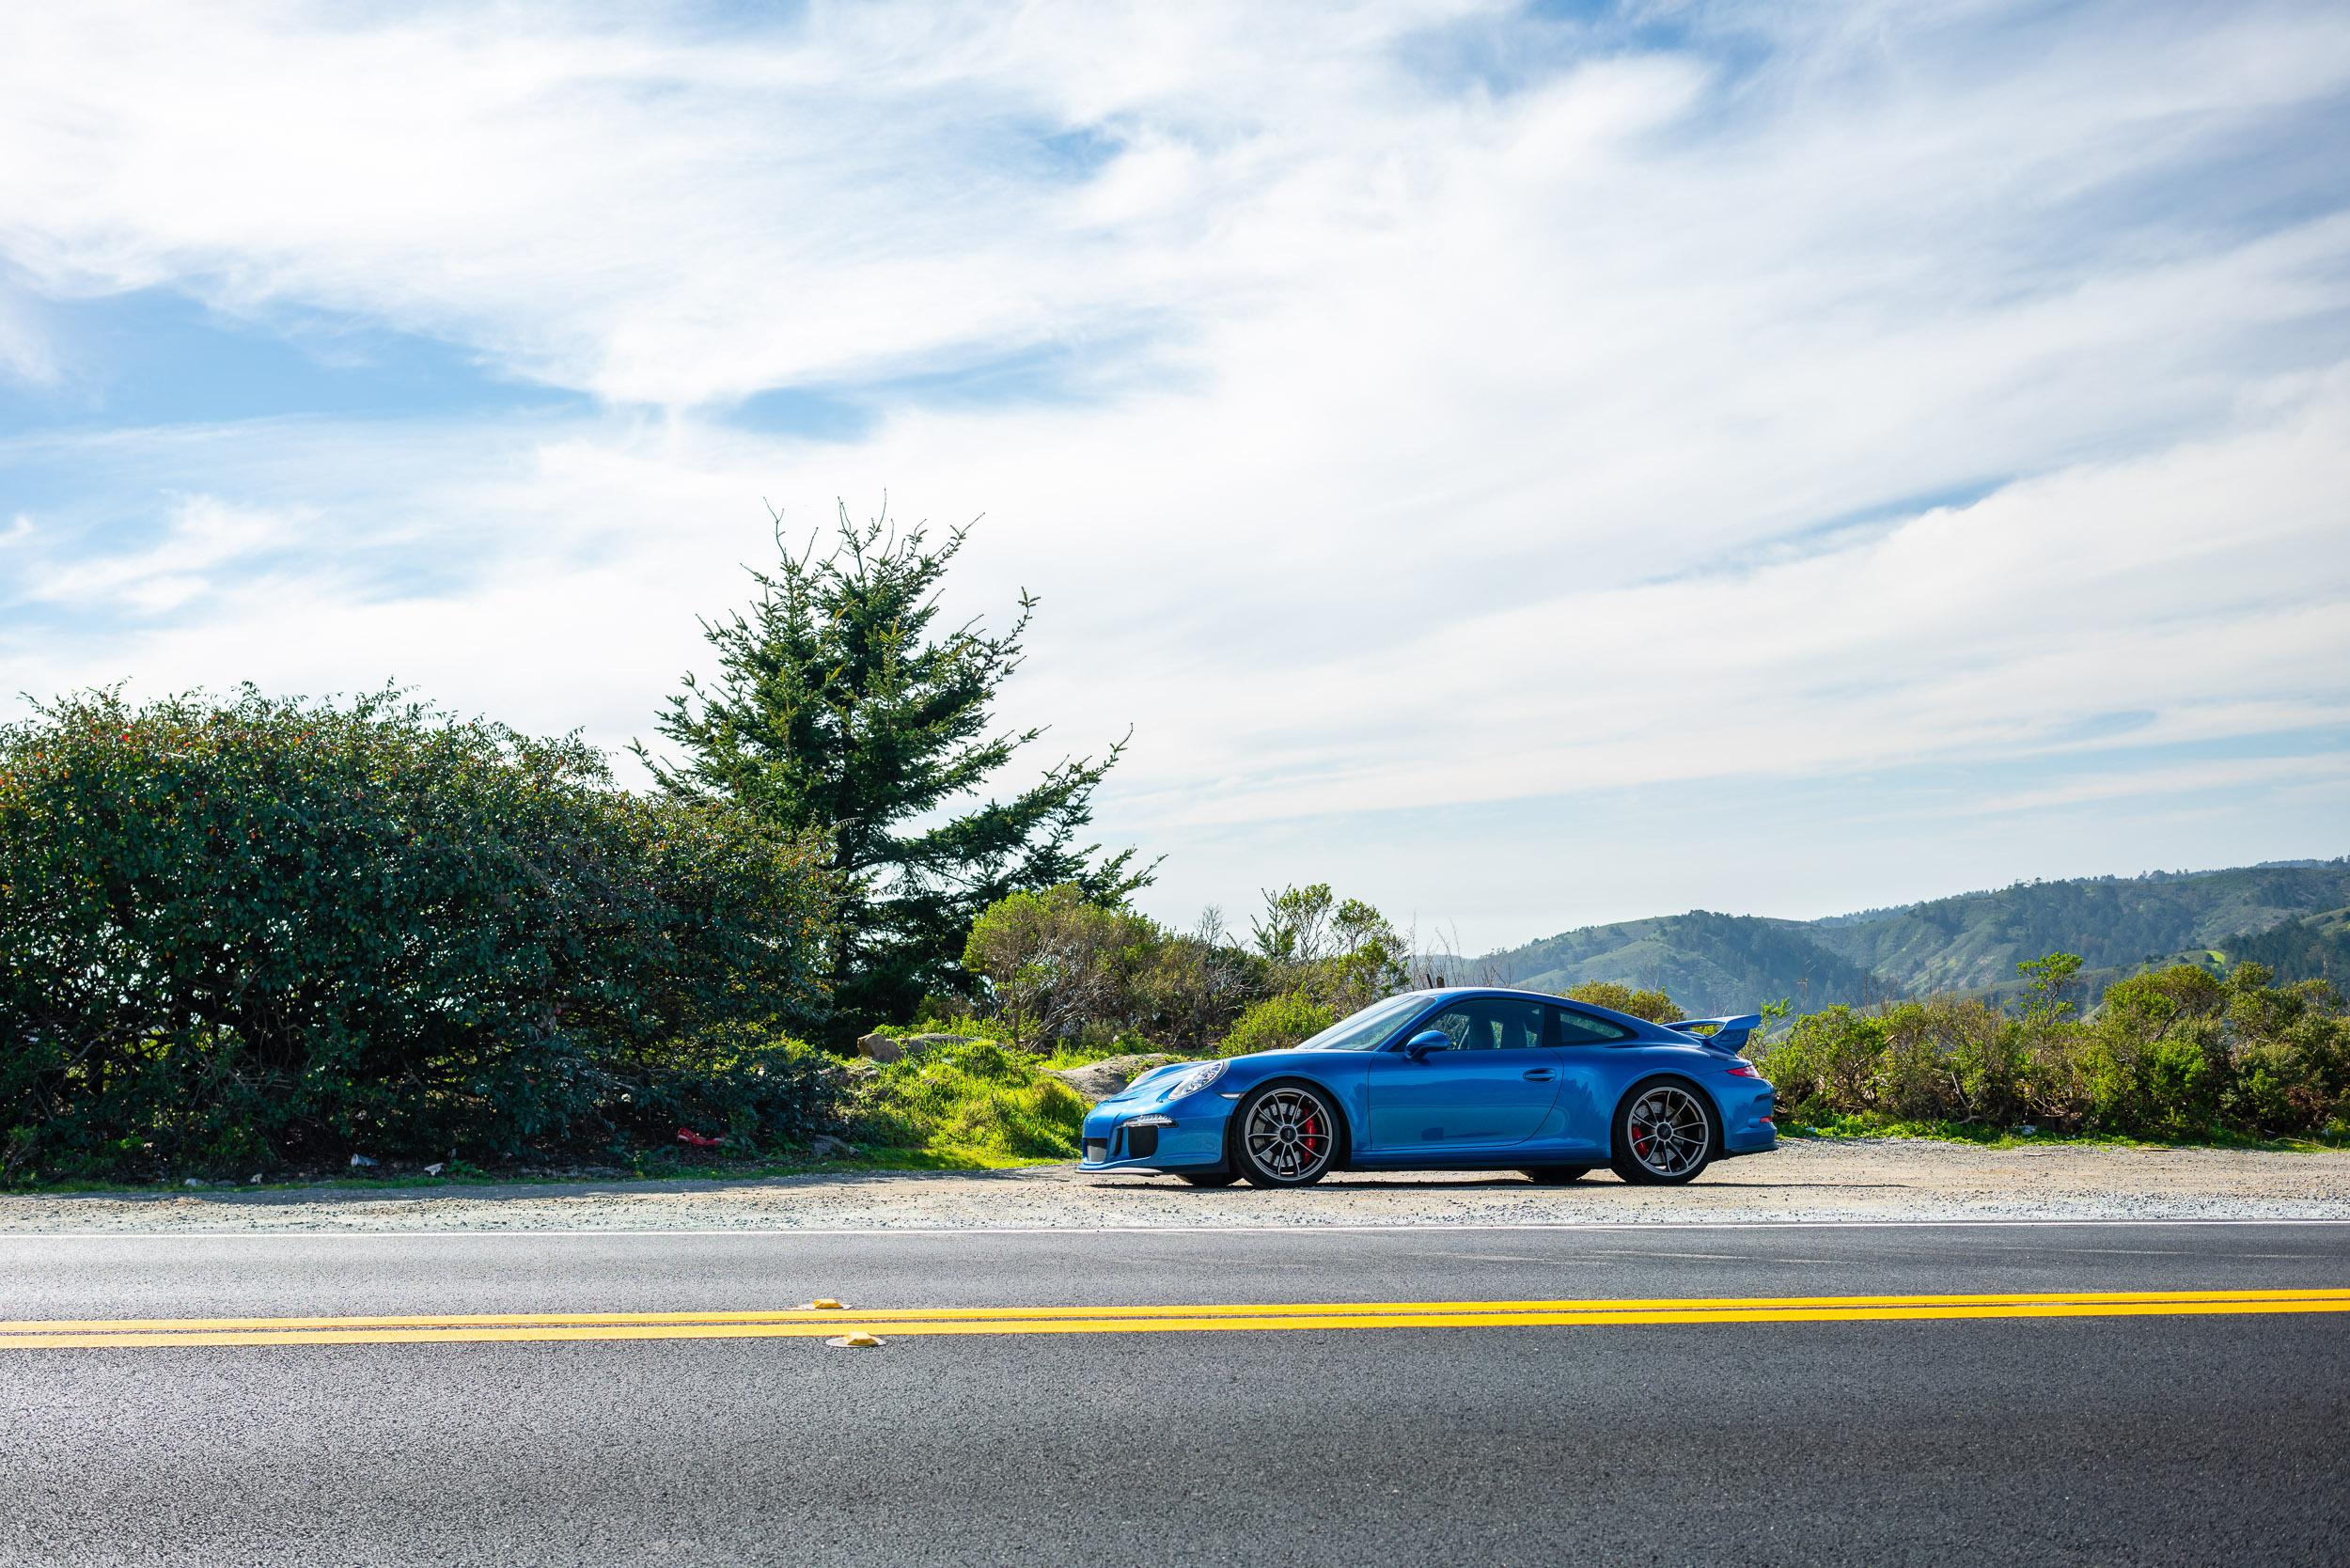 porsche-911-gt3-roadside-skyline.jpg